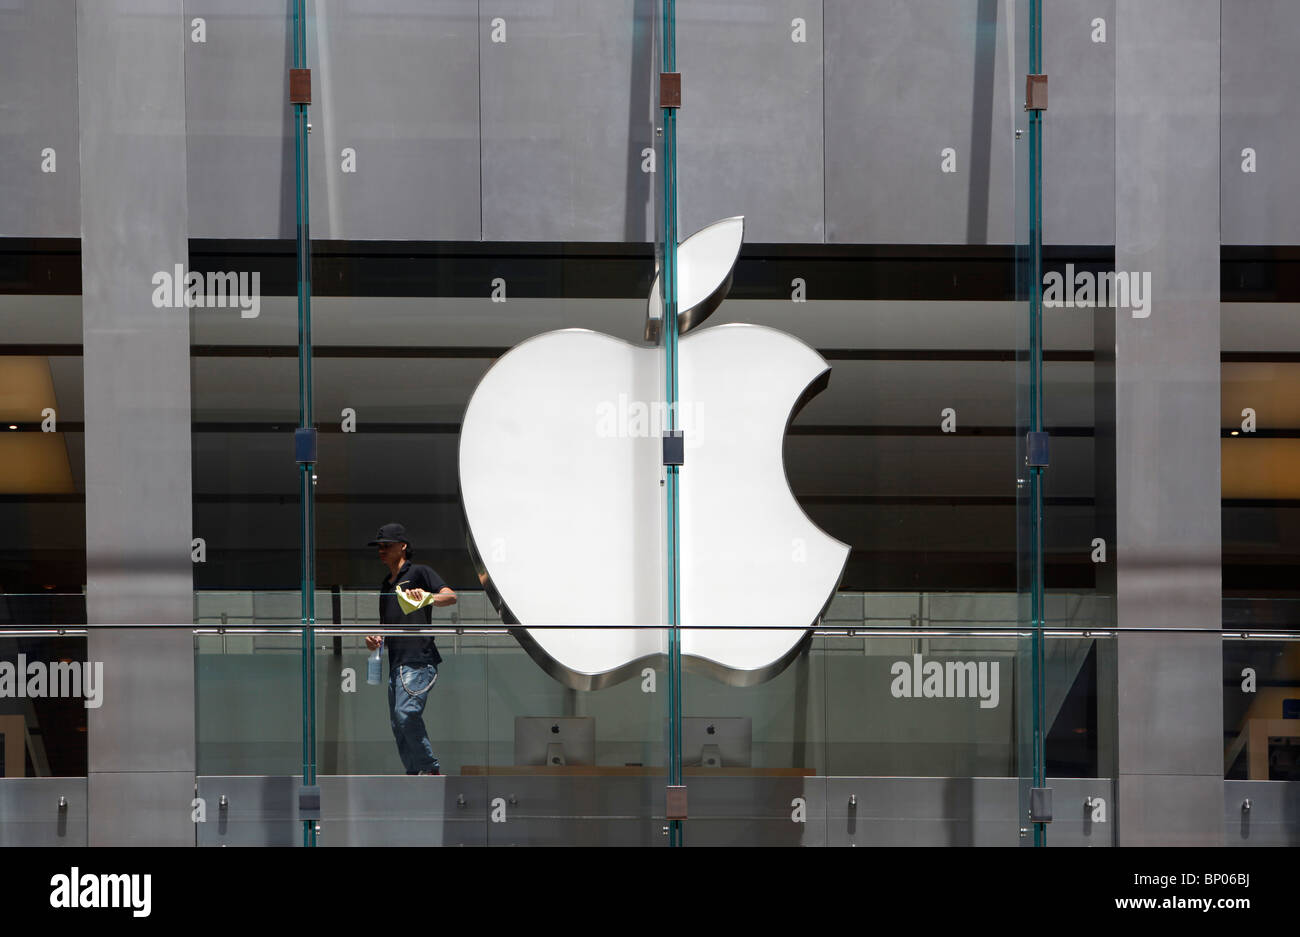 Man polishing the Apple store, Boston, Massachusetts Stock Photo